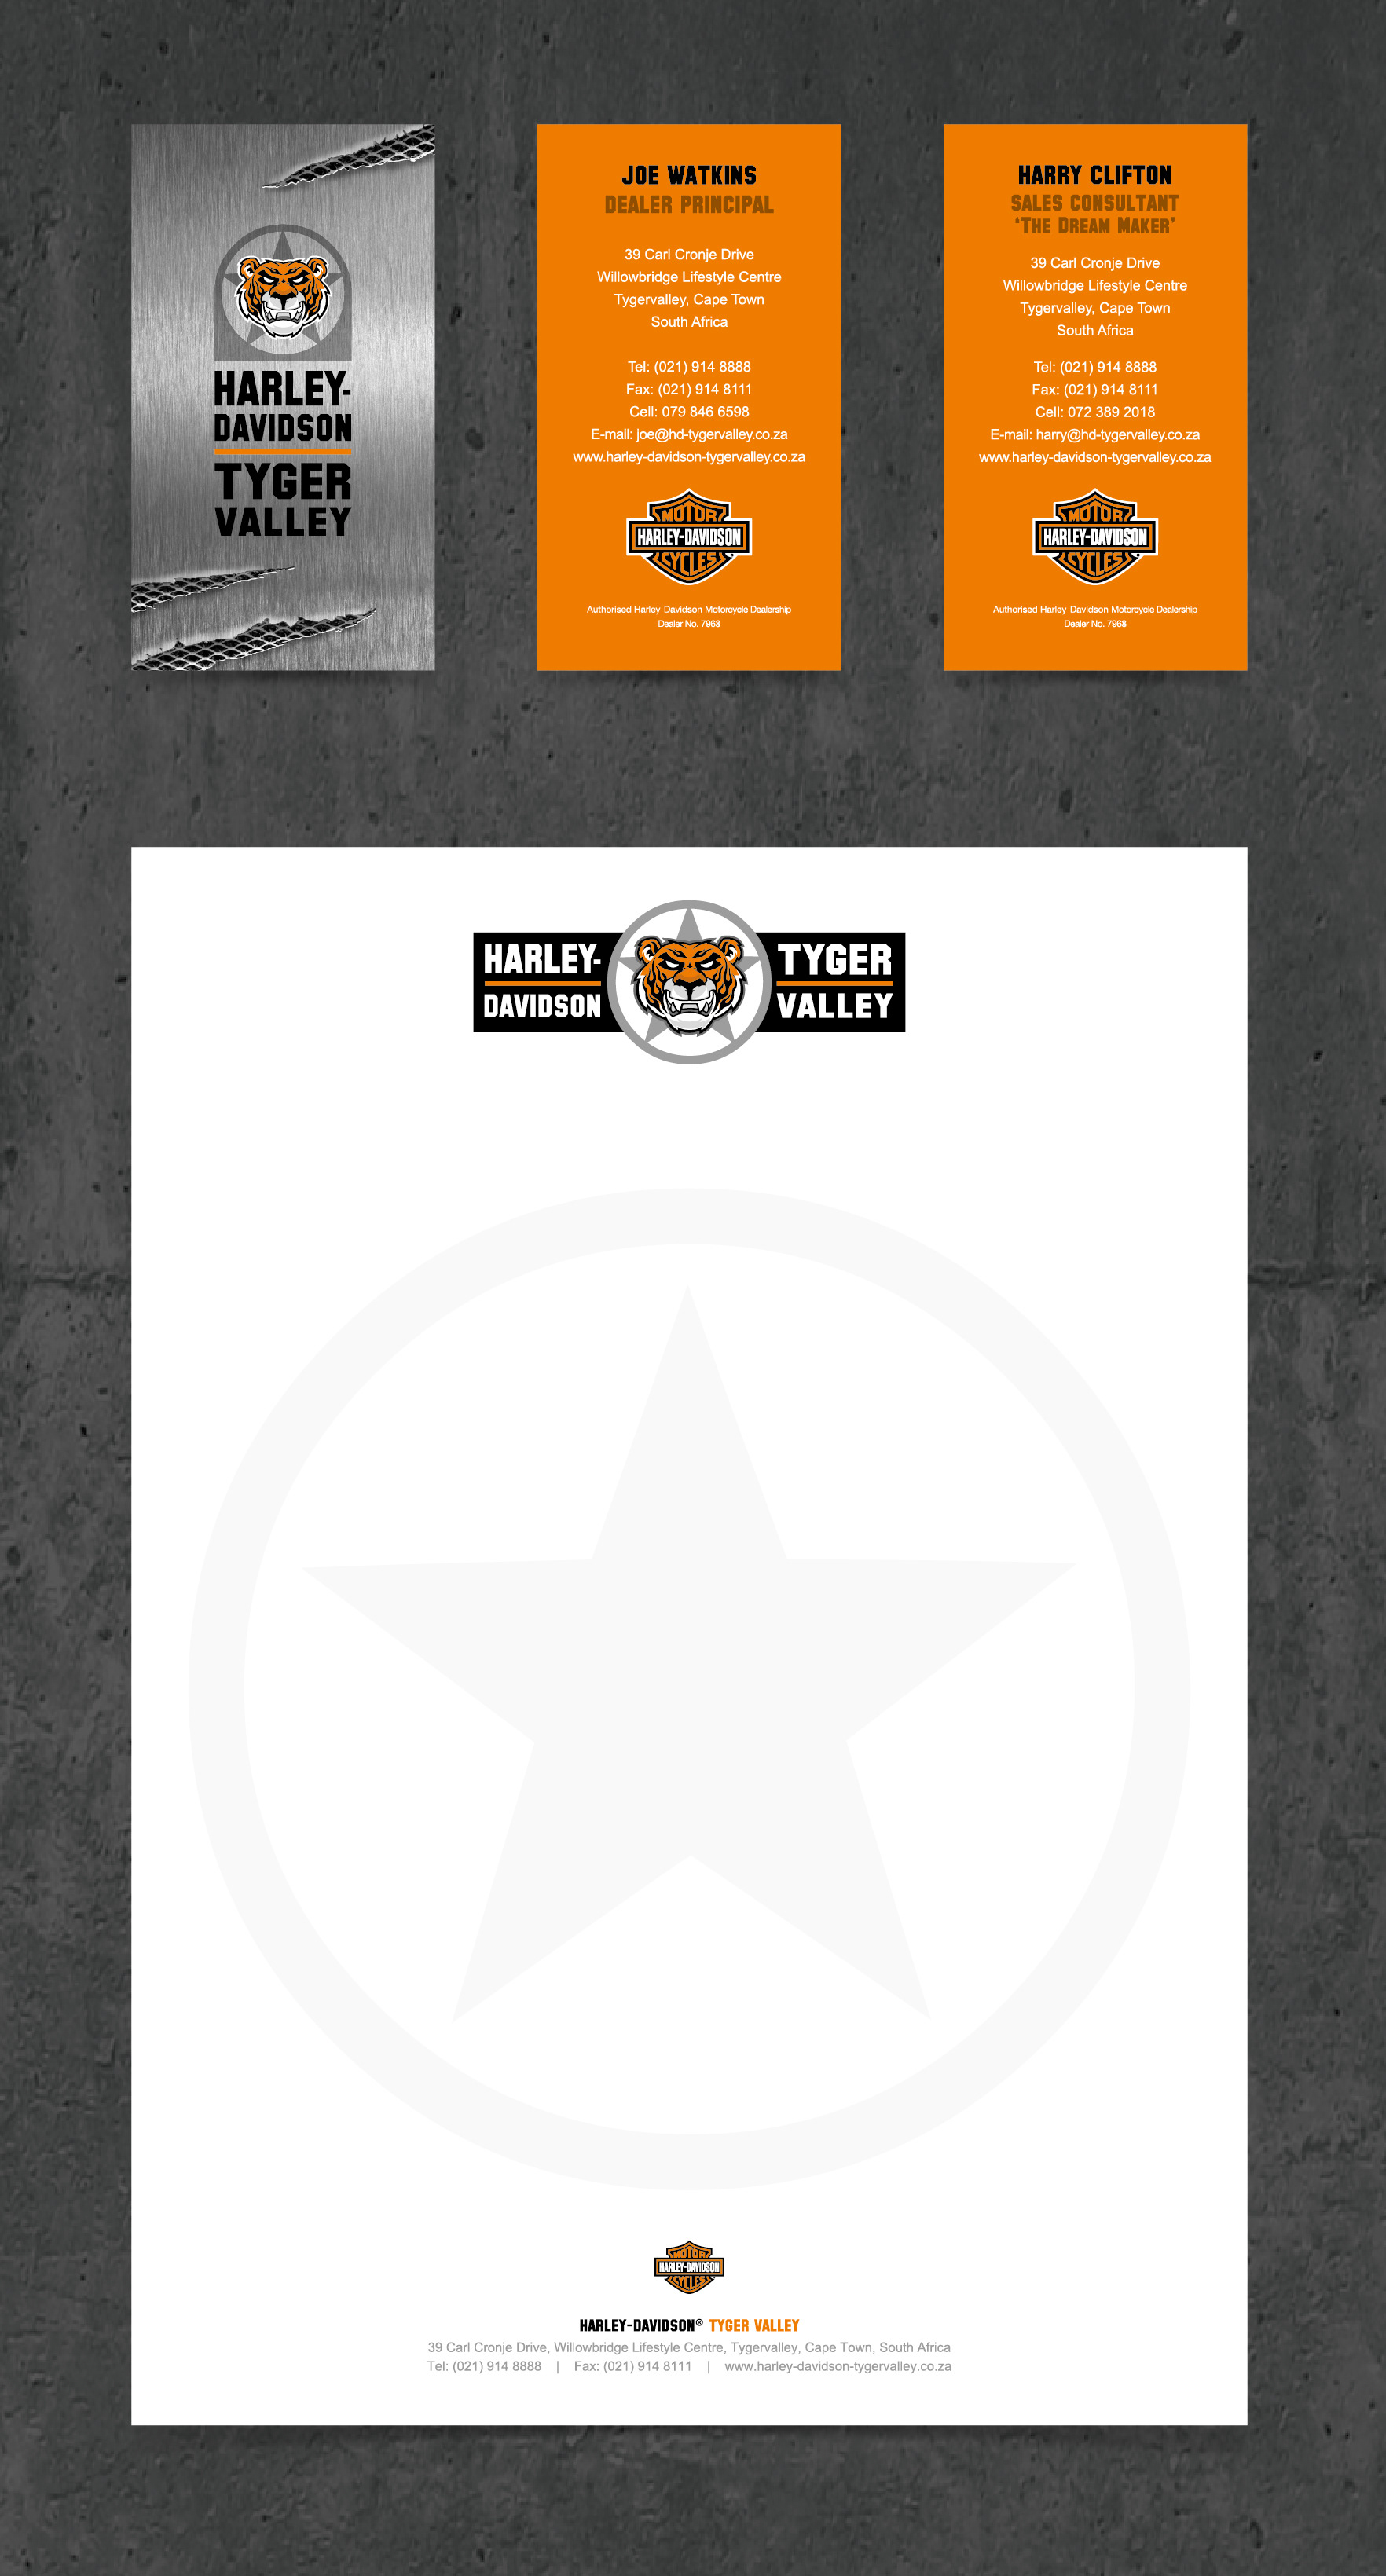 TURBINE-DESIGN - Harley Tyger Valley Identity